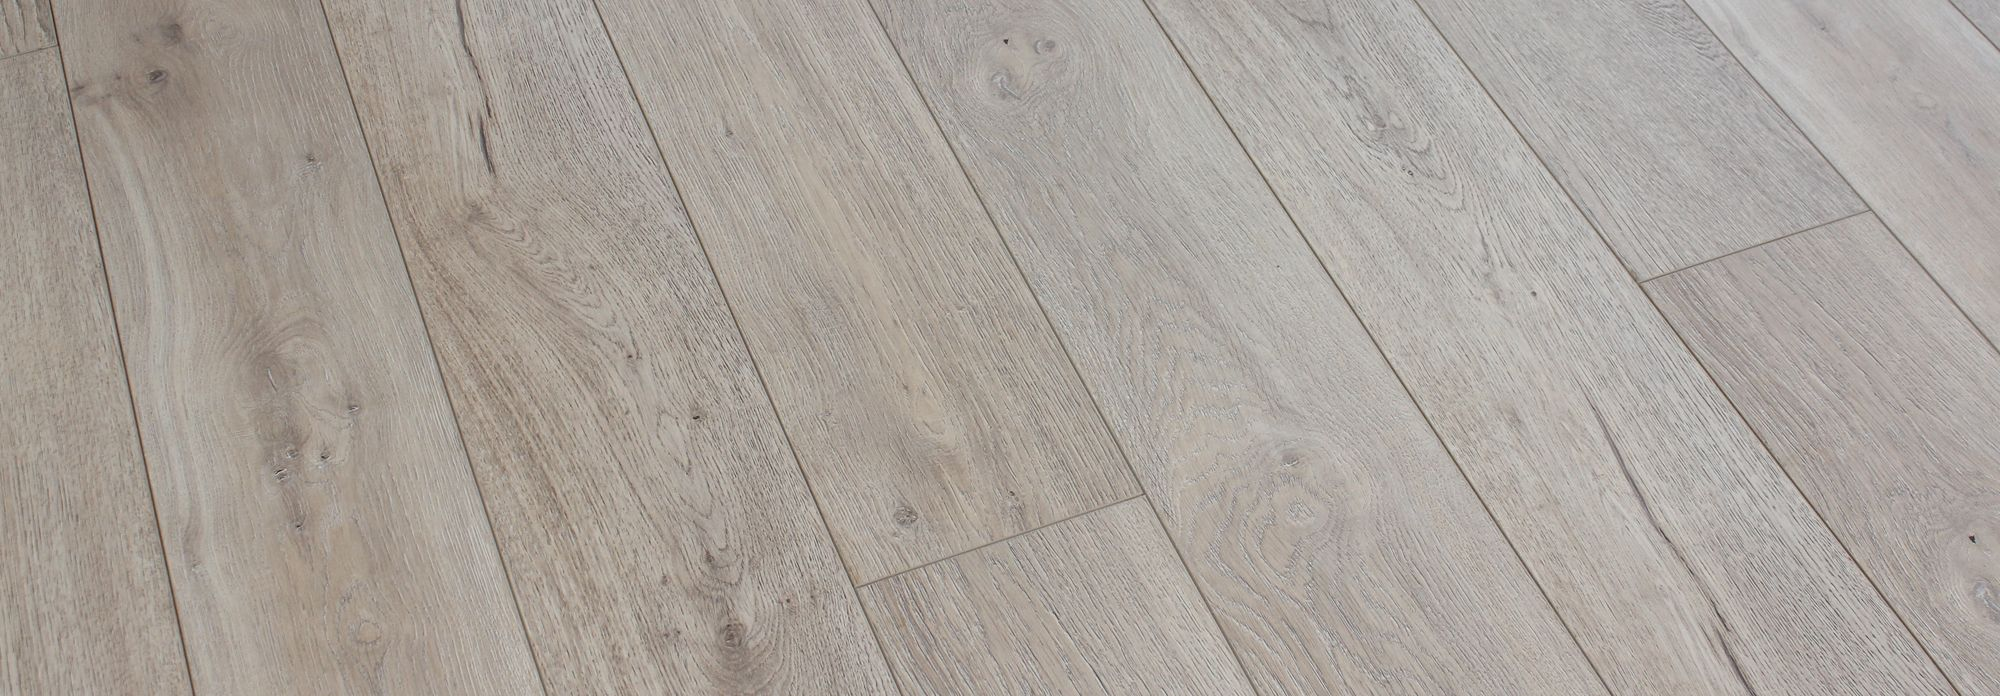 Limed Oak Flooring Flooring Ideas And Inspiration